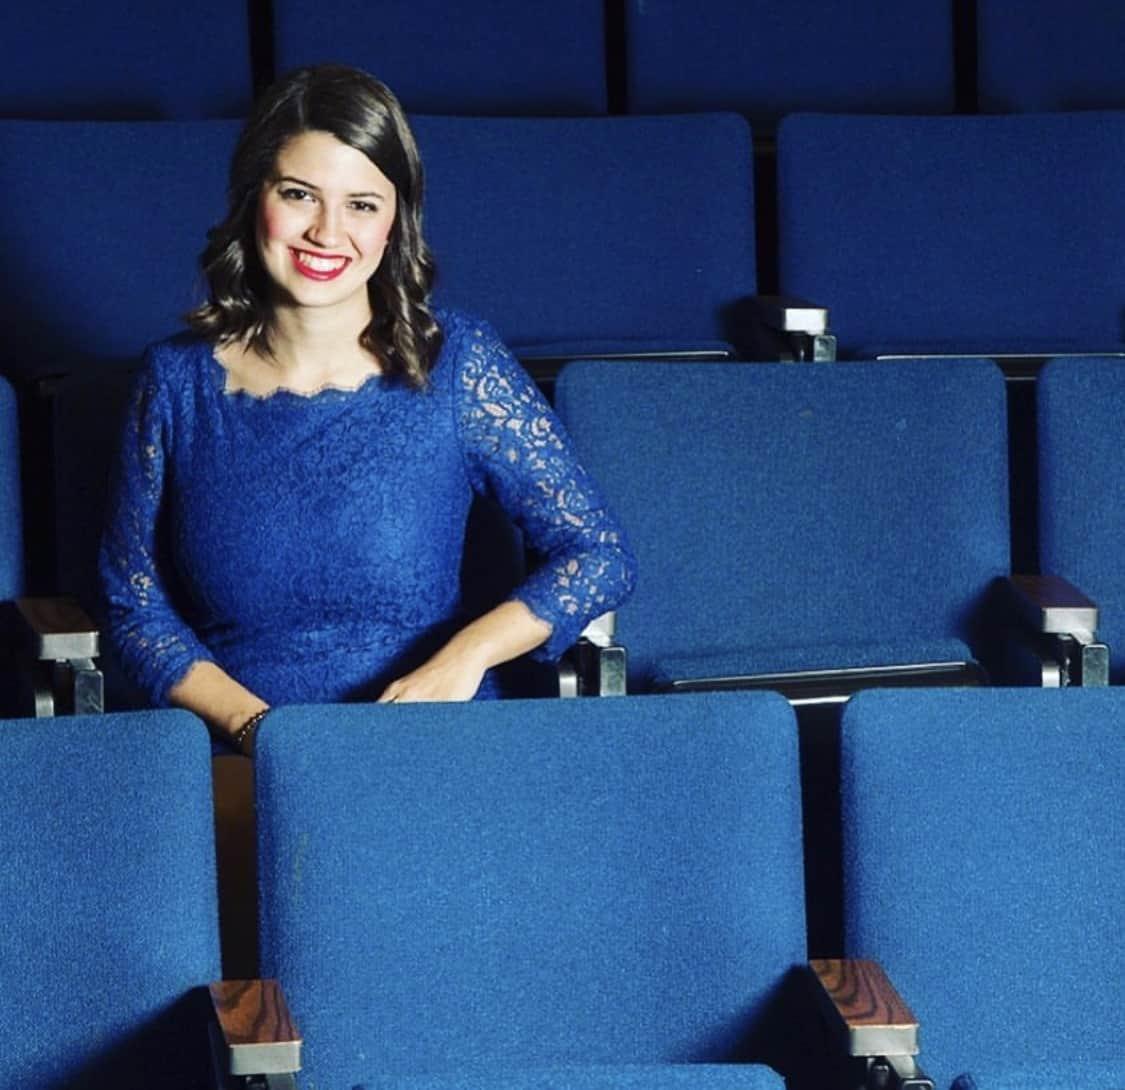 Promotional image of Miriam Edelstein.